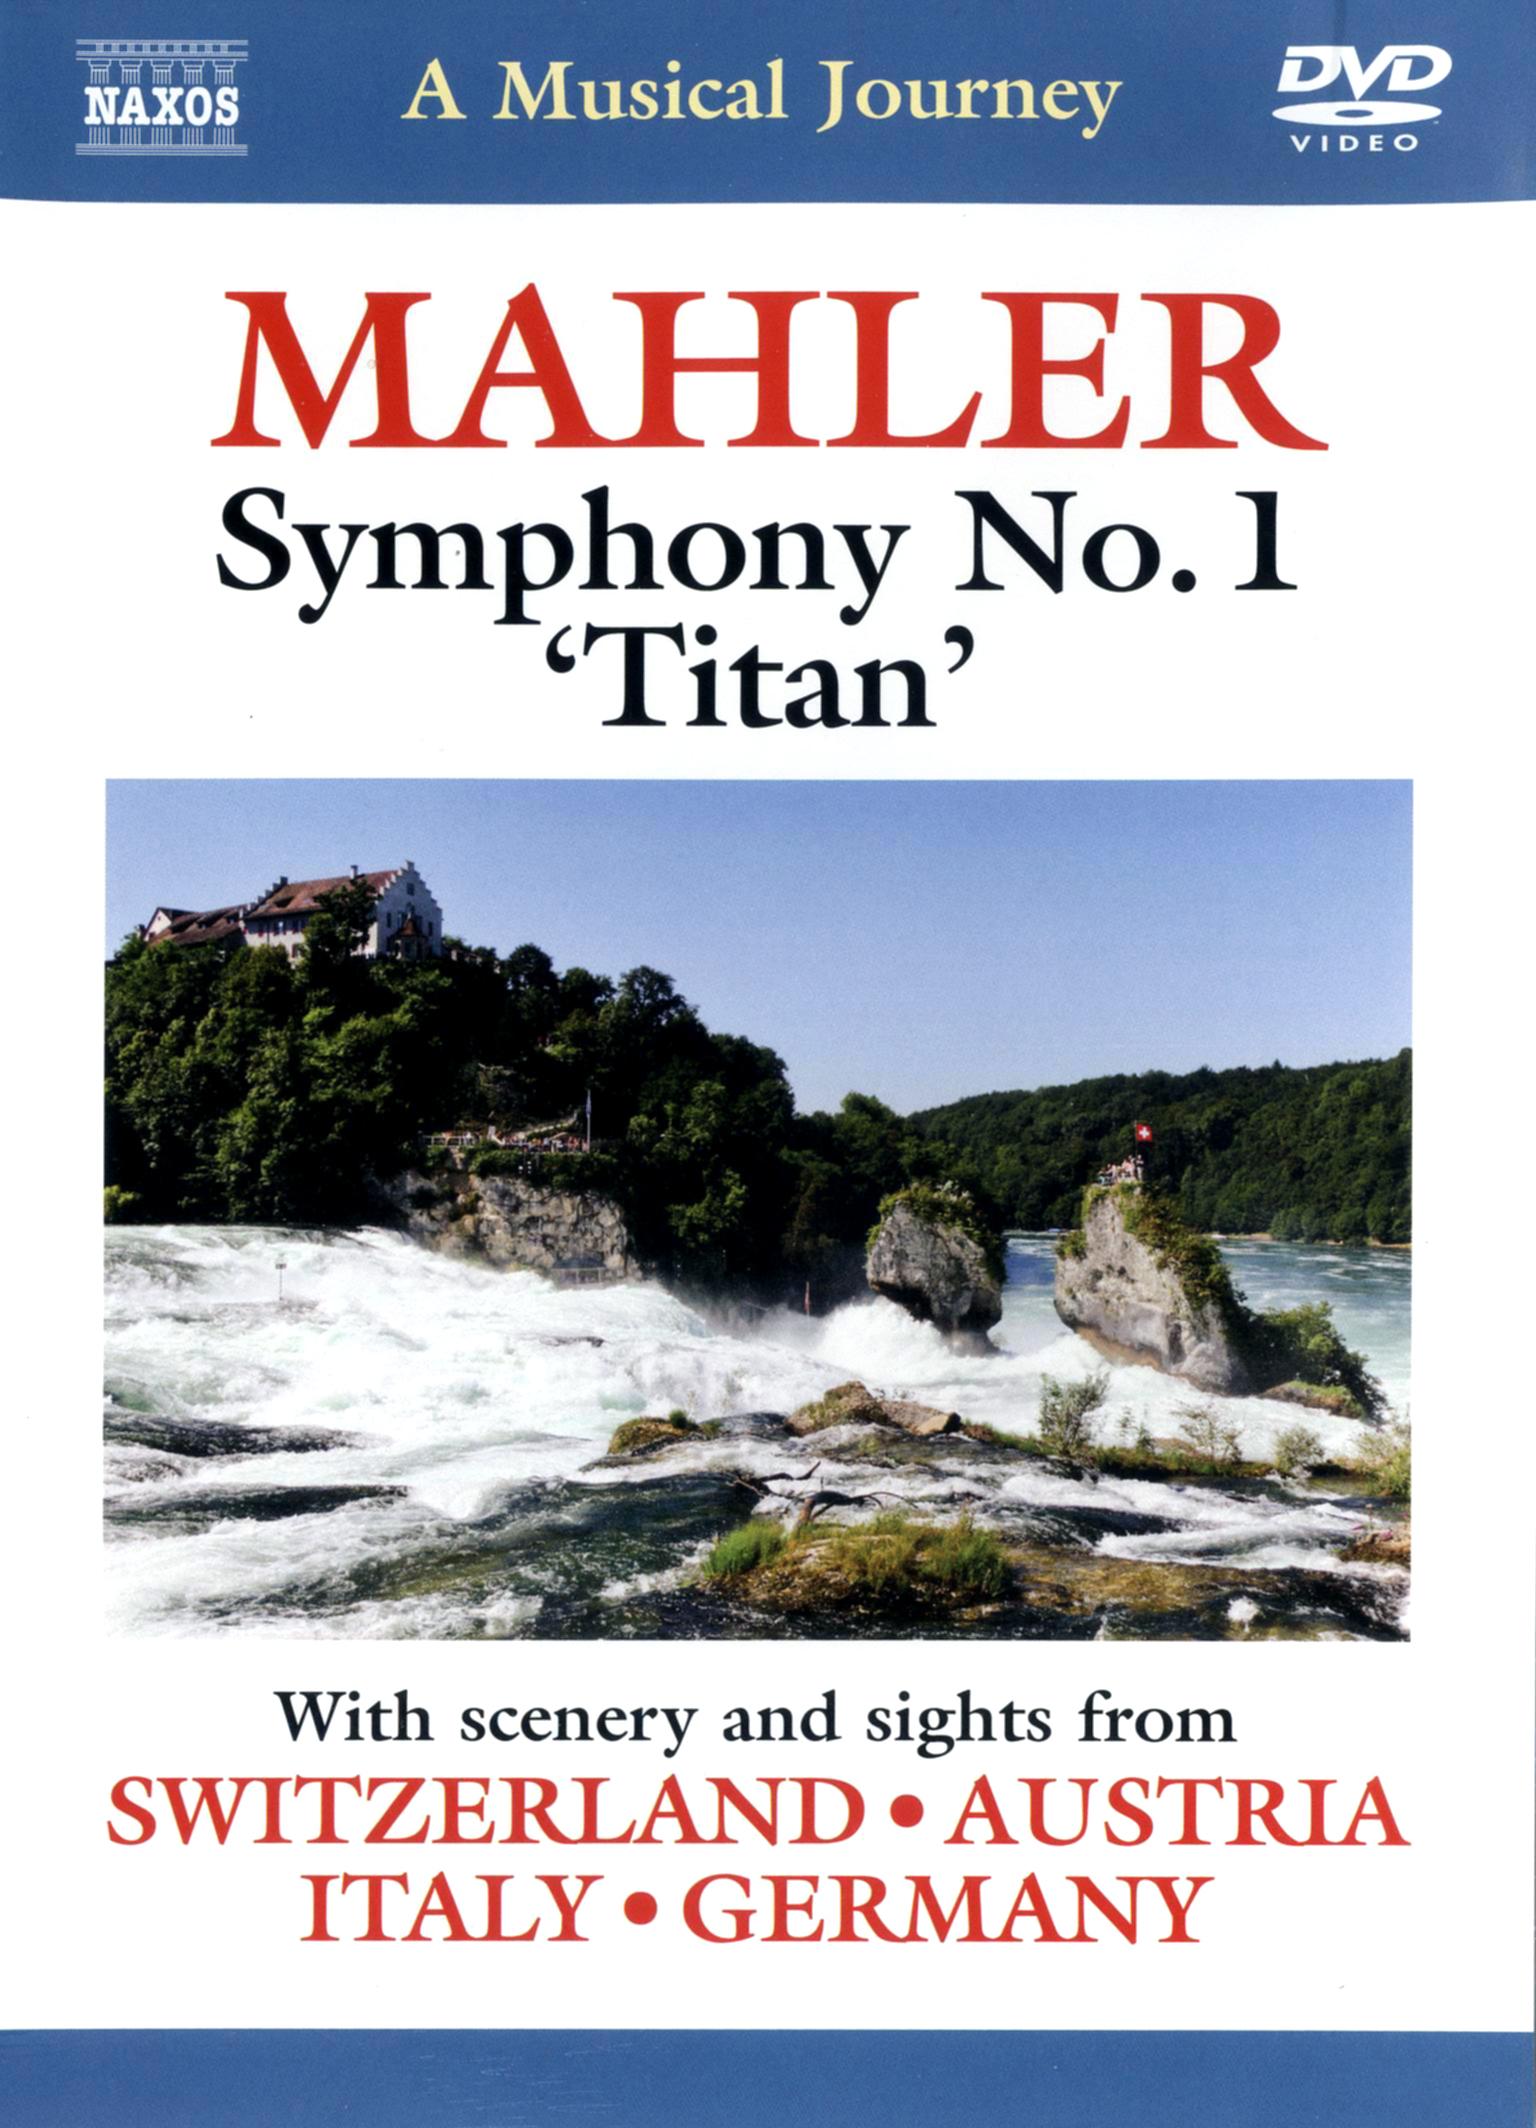 A Musical Journey: Mahler Symphony No. 1 'Titan' - Switzerland/Austria/Italy/Germany